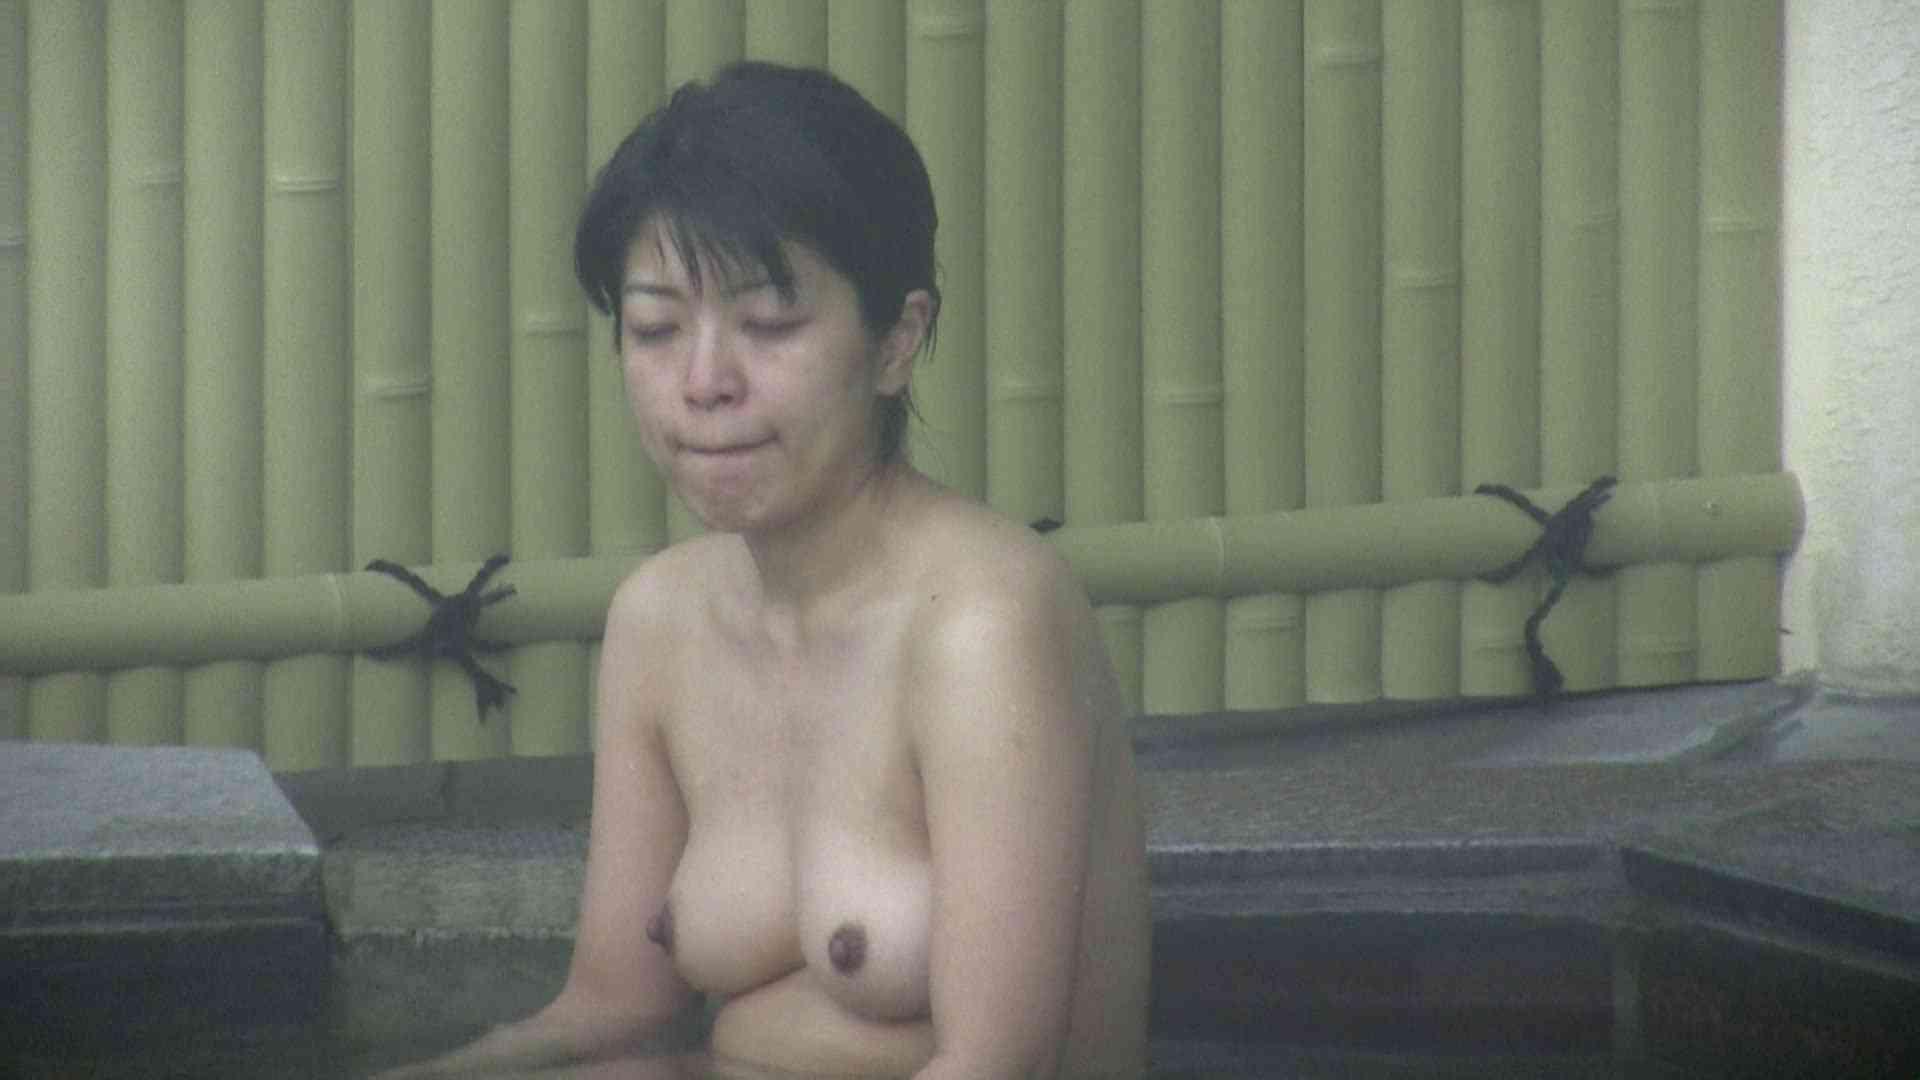 Aquaな露天風呂Vol.585 盗撮 | OLエロ画像  78PICs 28